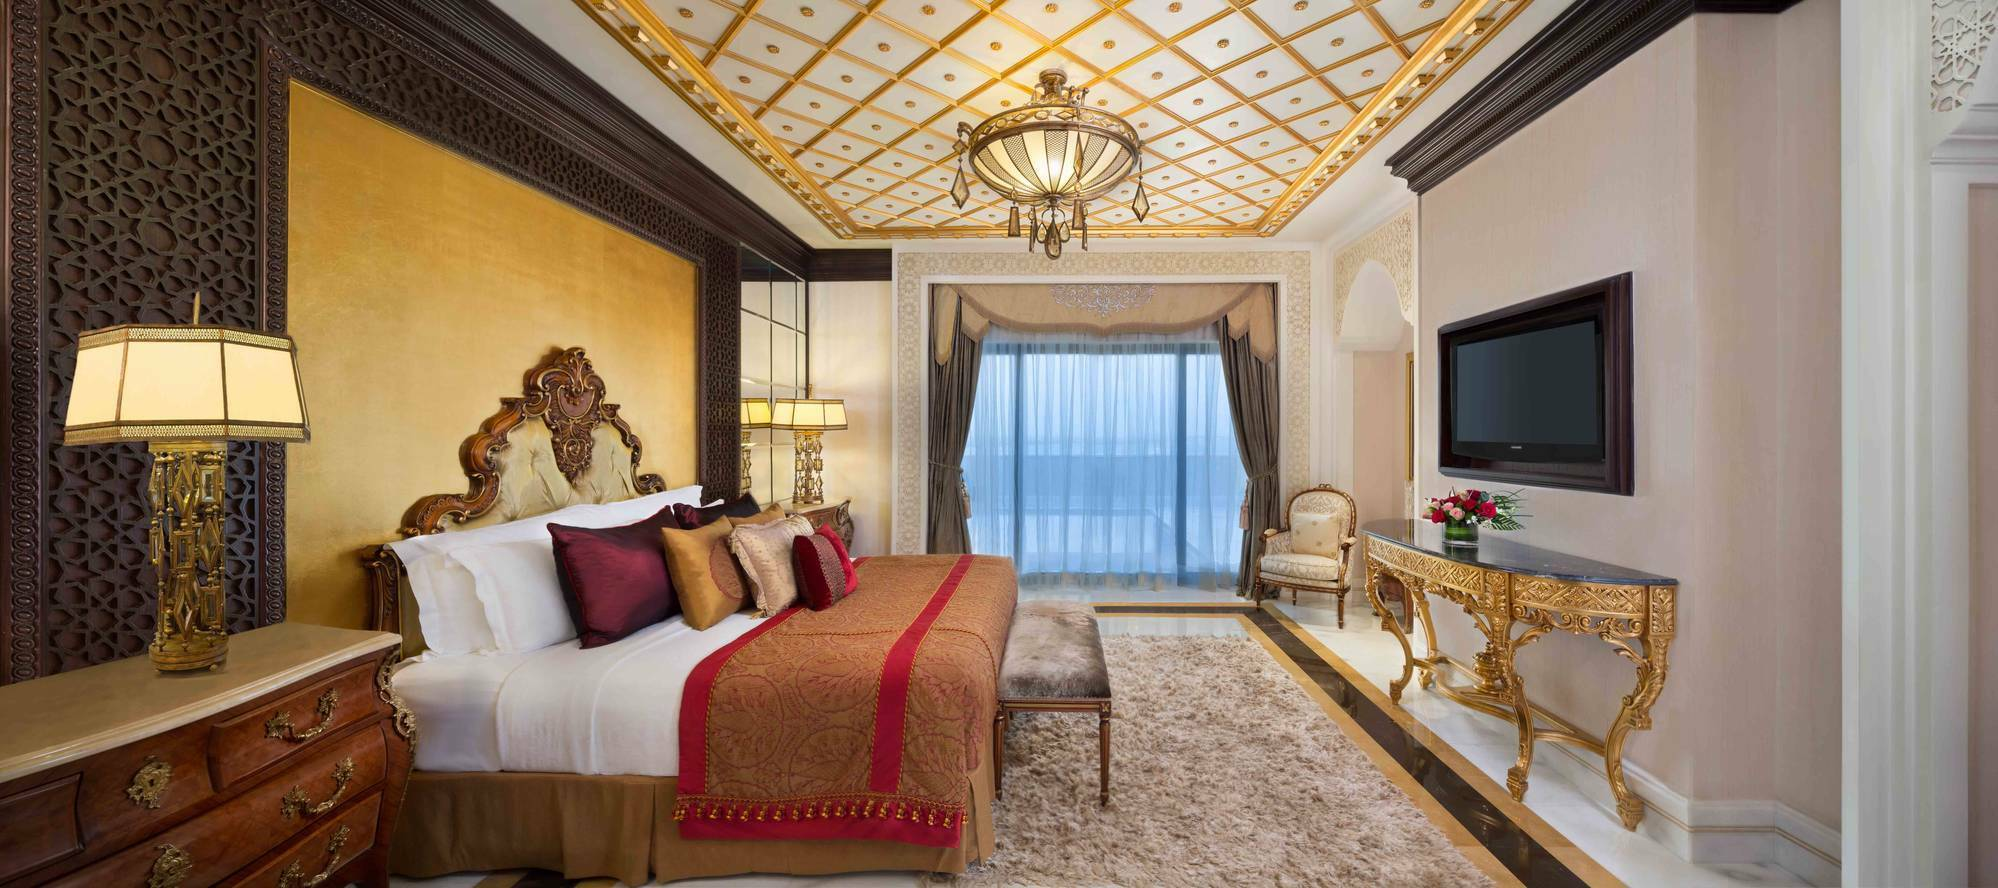 Jumeirah Zabeel Saray Grand Imperial Suite Chambre Dubai